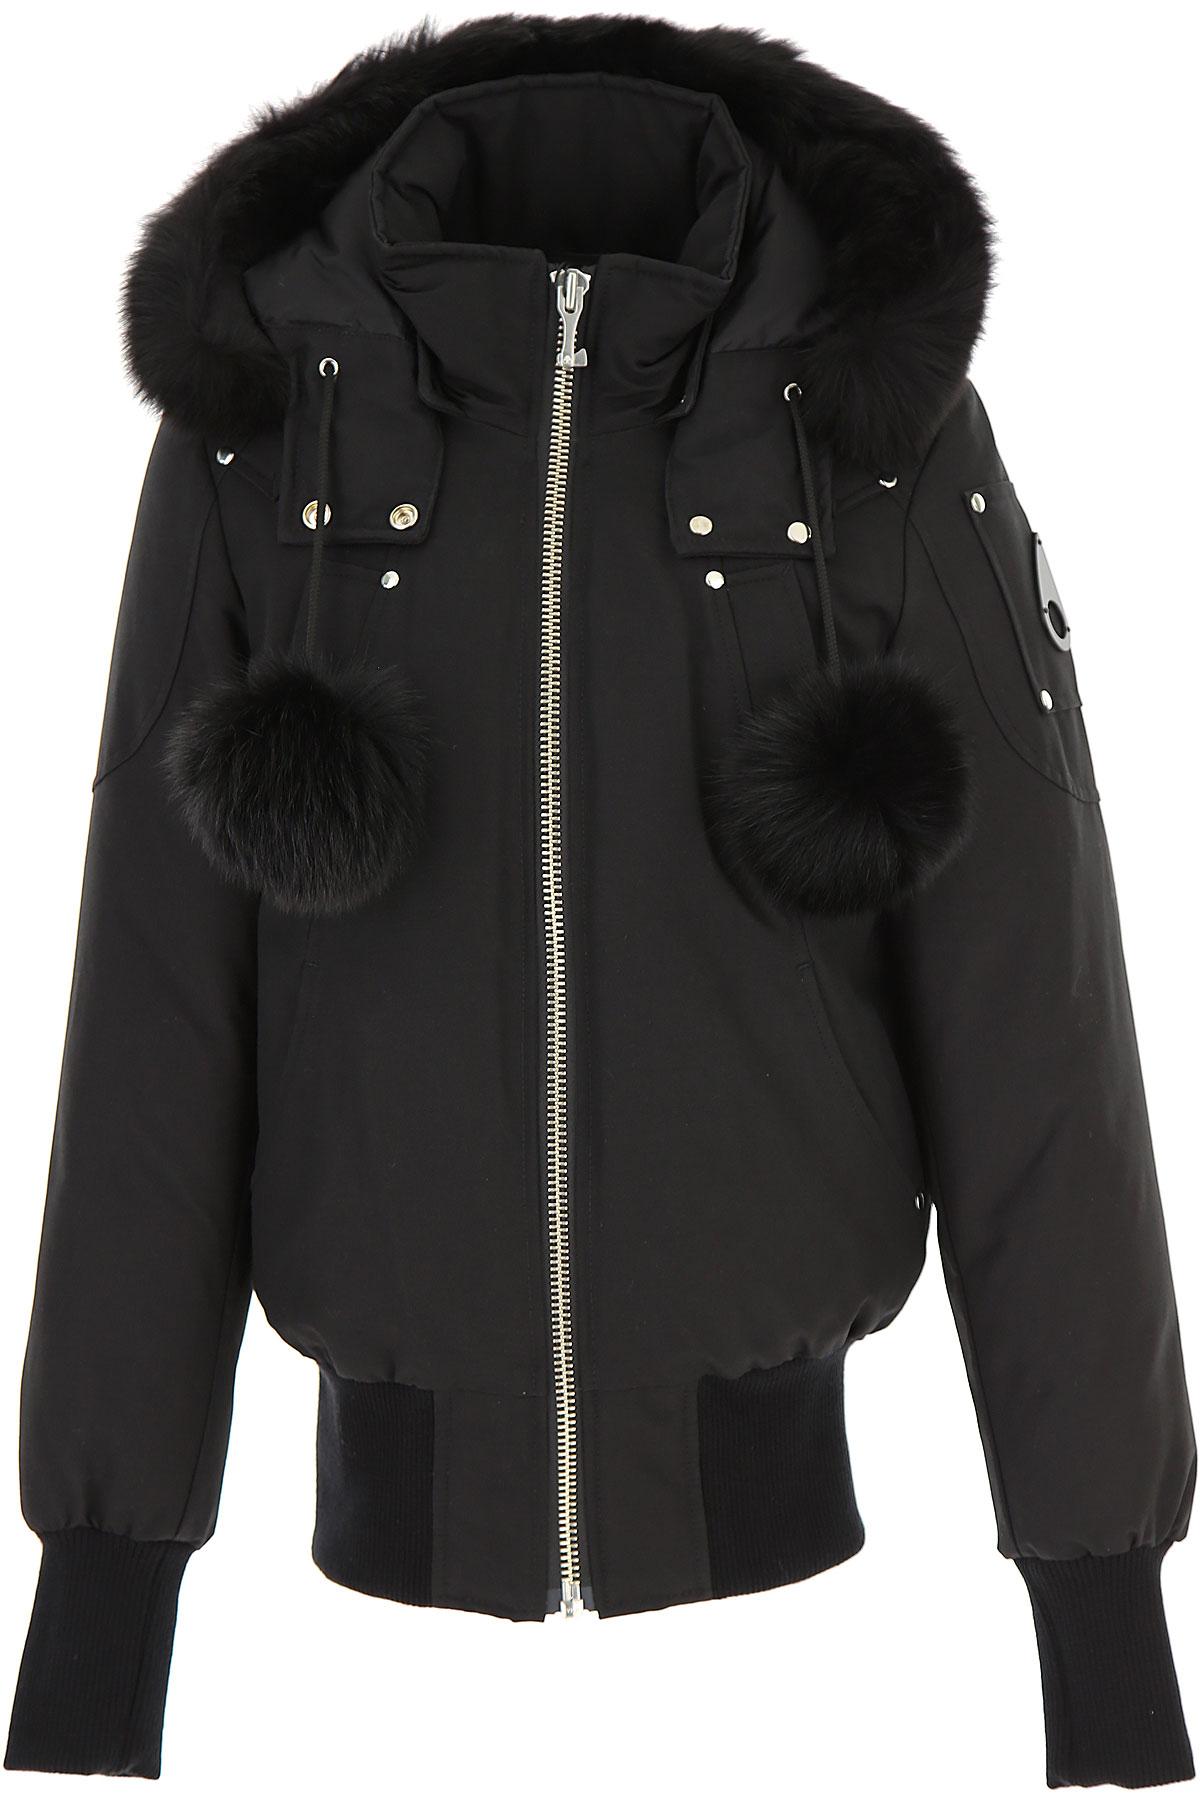 Moose Knuckles Down Jacket for Women, Puffer Ski Jacket On Sale, Black, polyester, 2019, 2 4 6